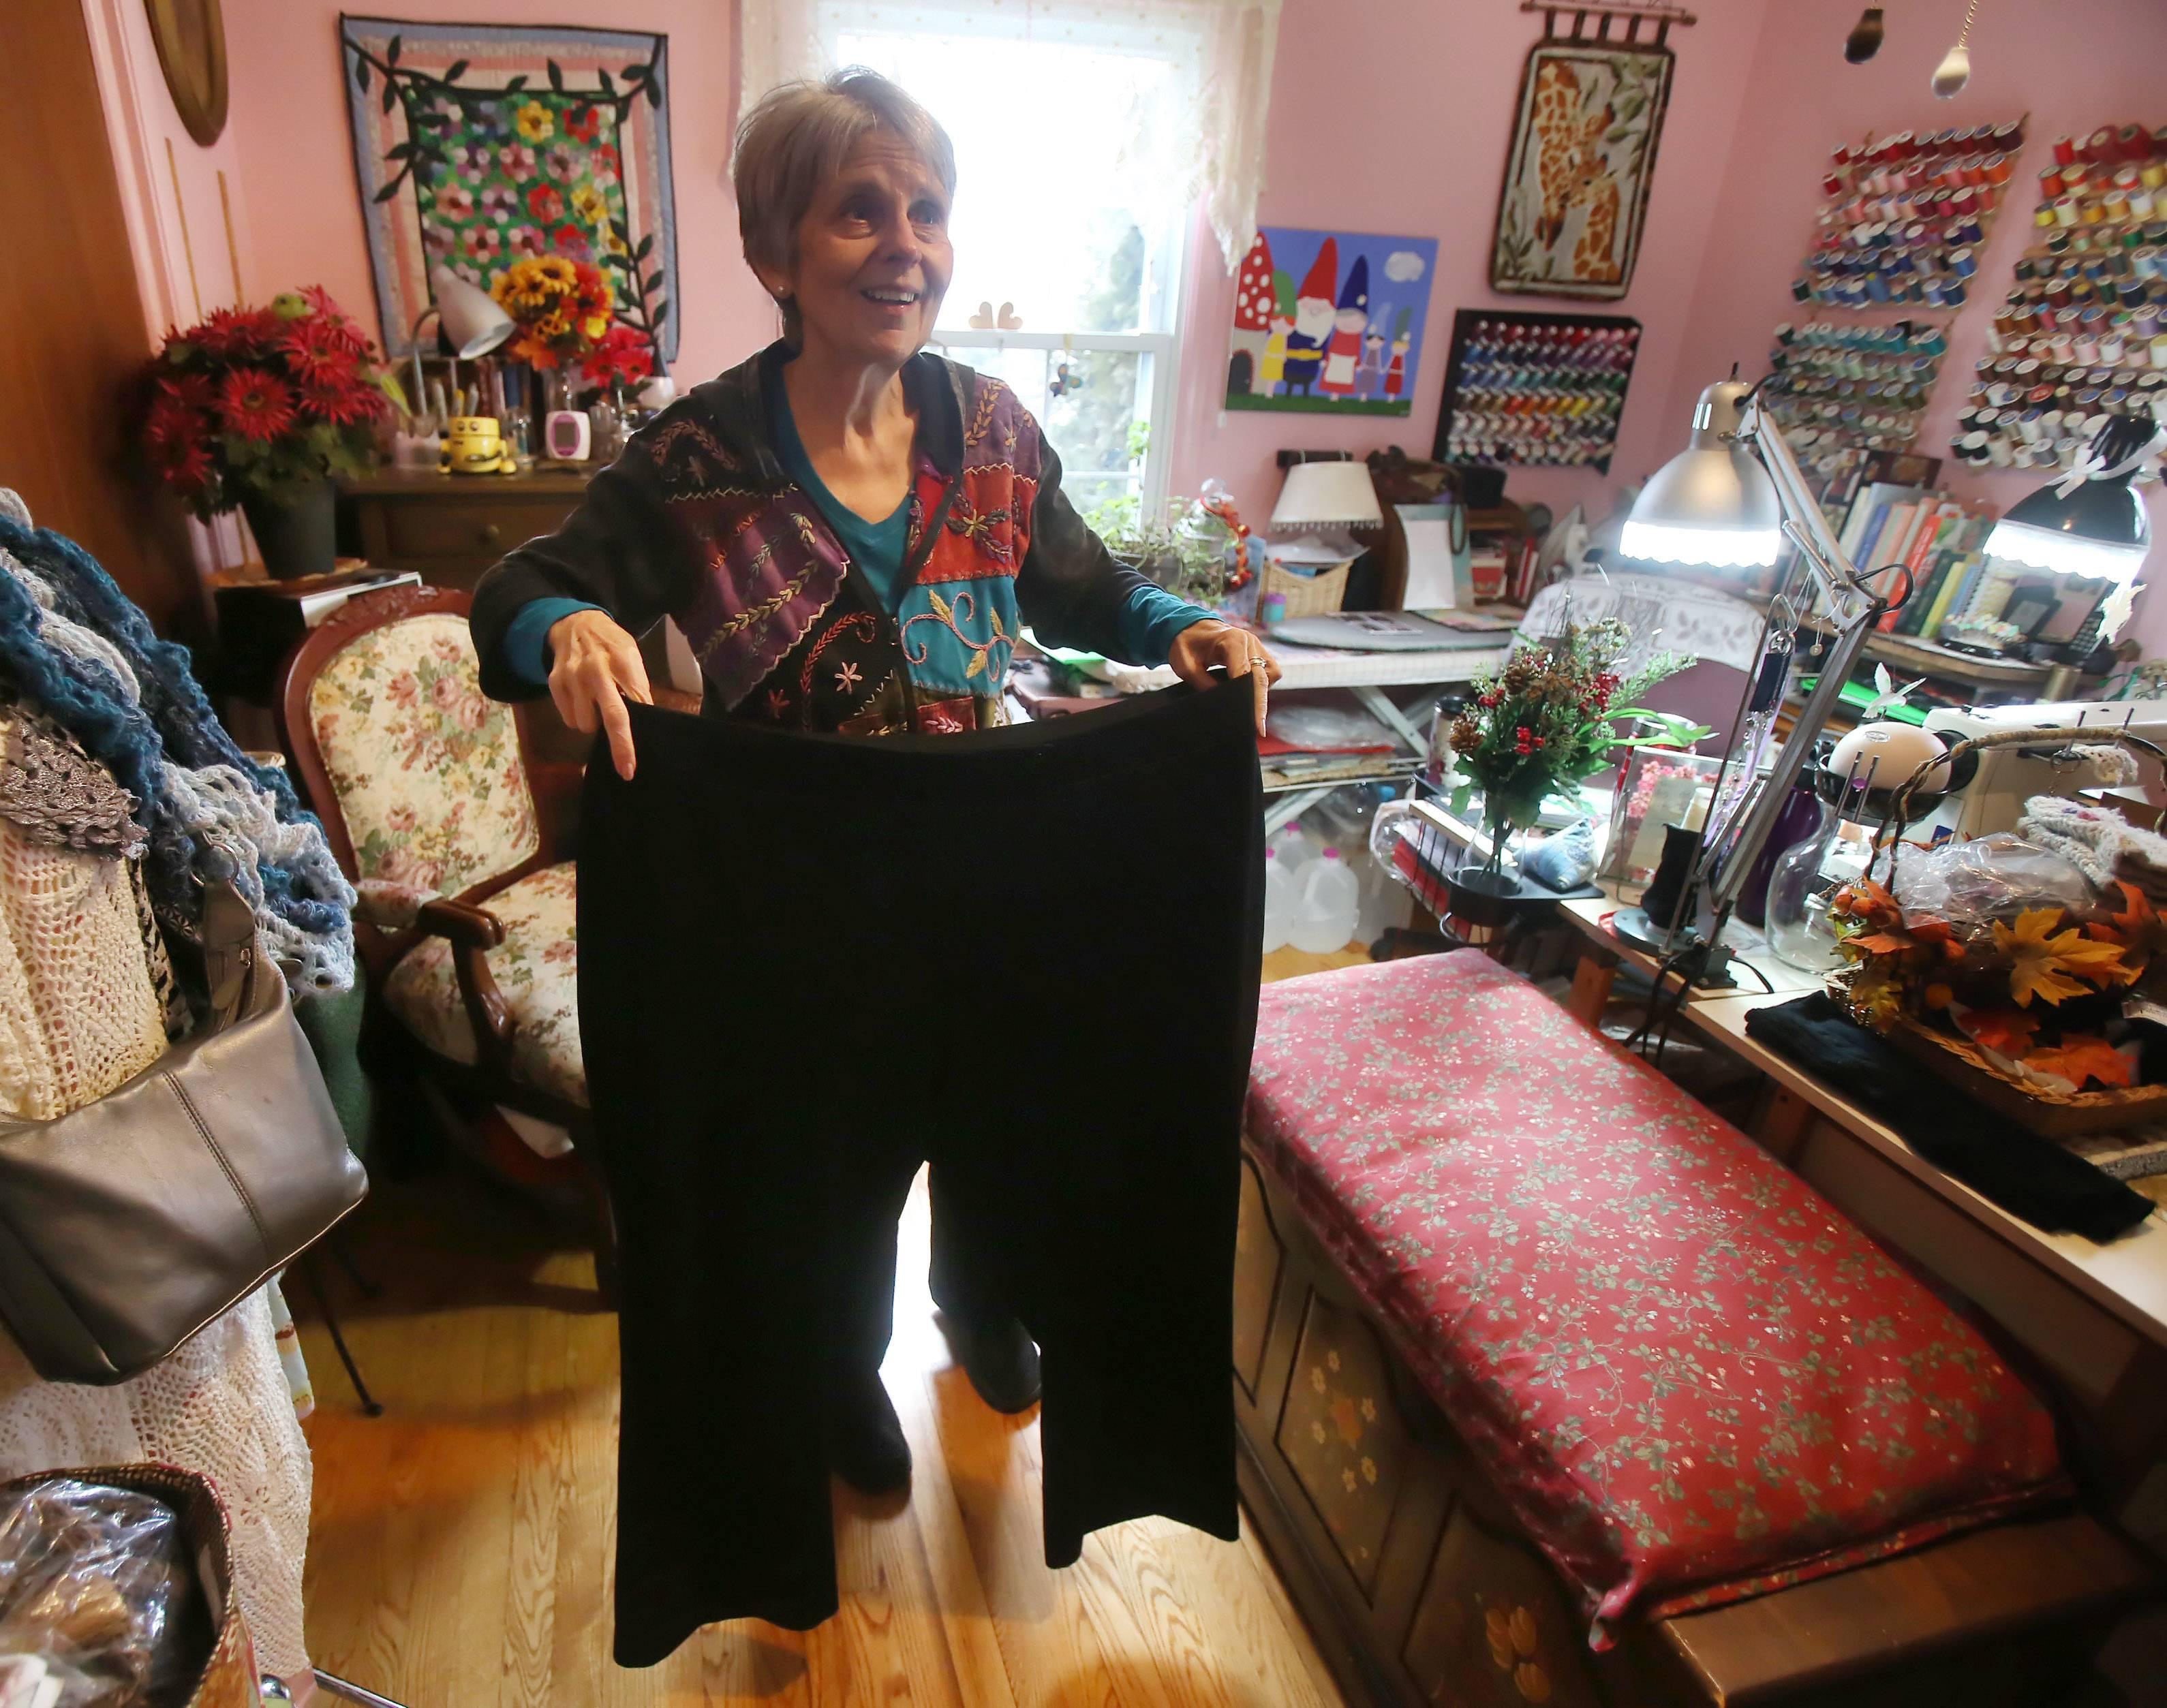 63-year-old Grayslake woman drops 170 pounds